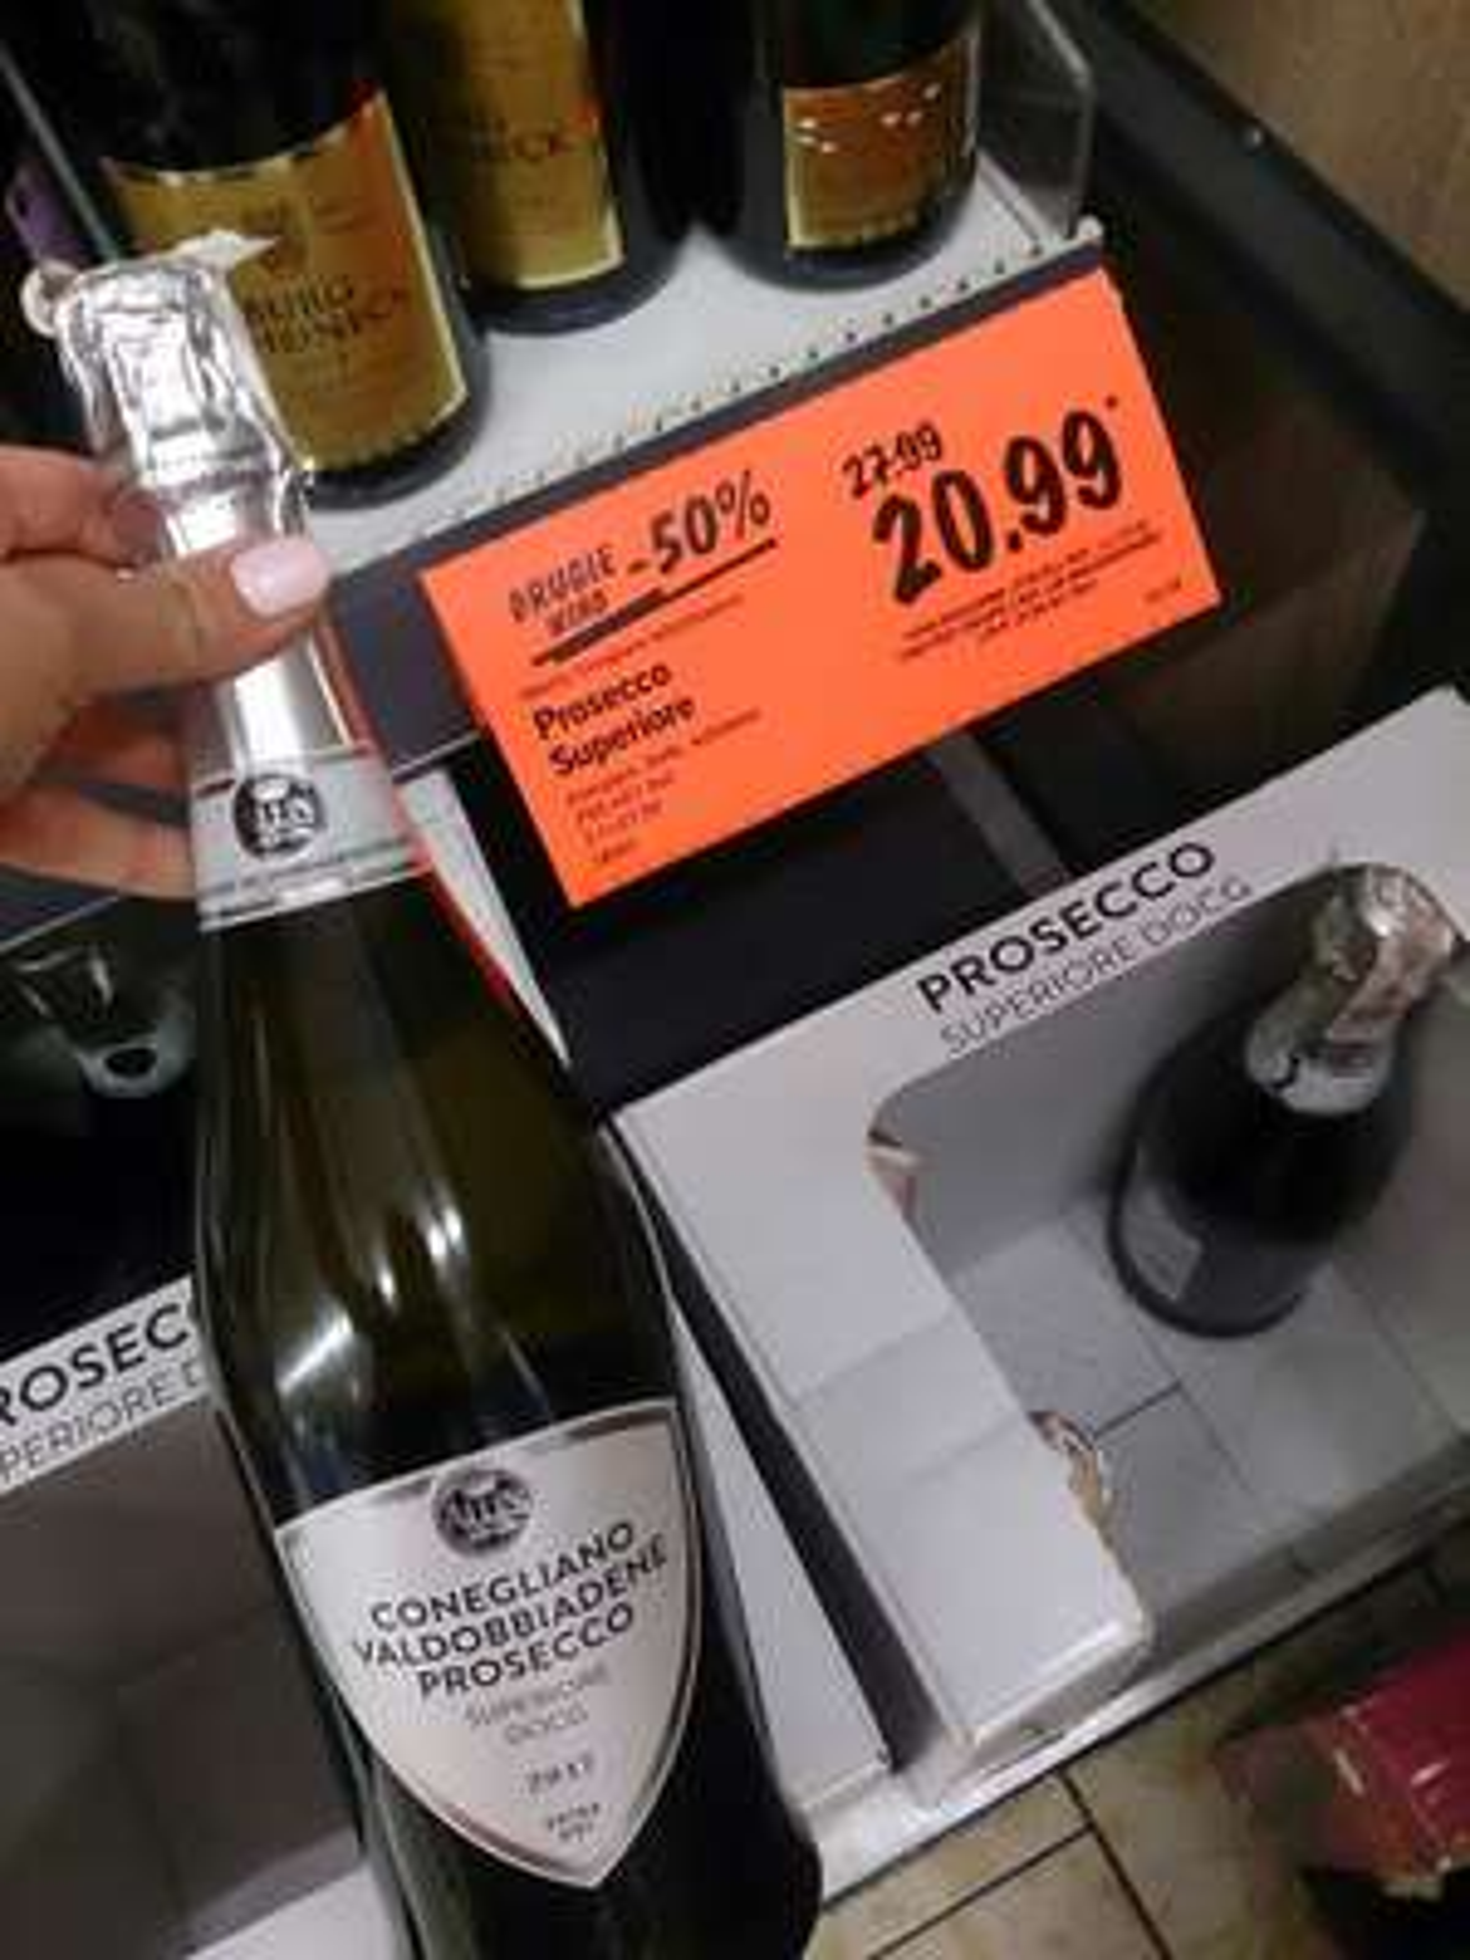 Prosecco Superiore drugie -50% w Lidlu (wino musujące)